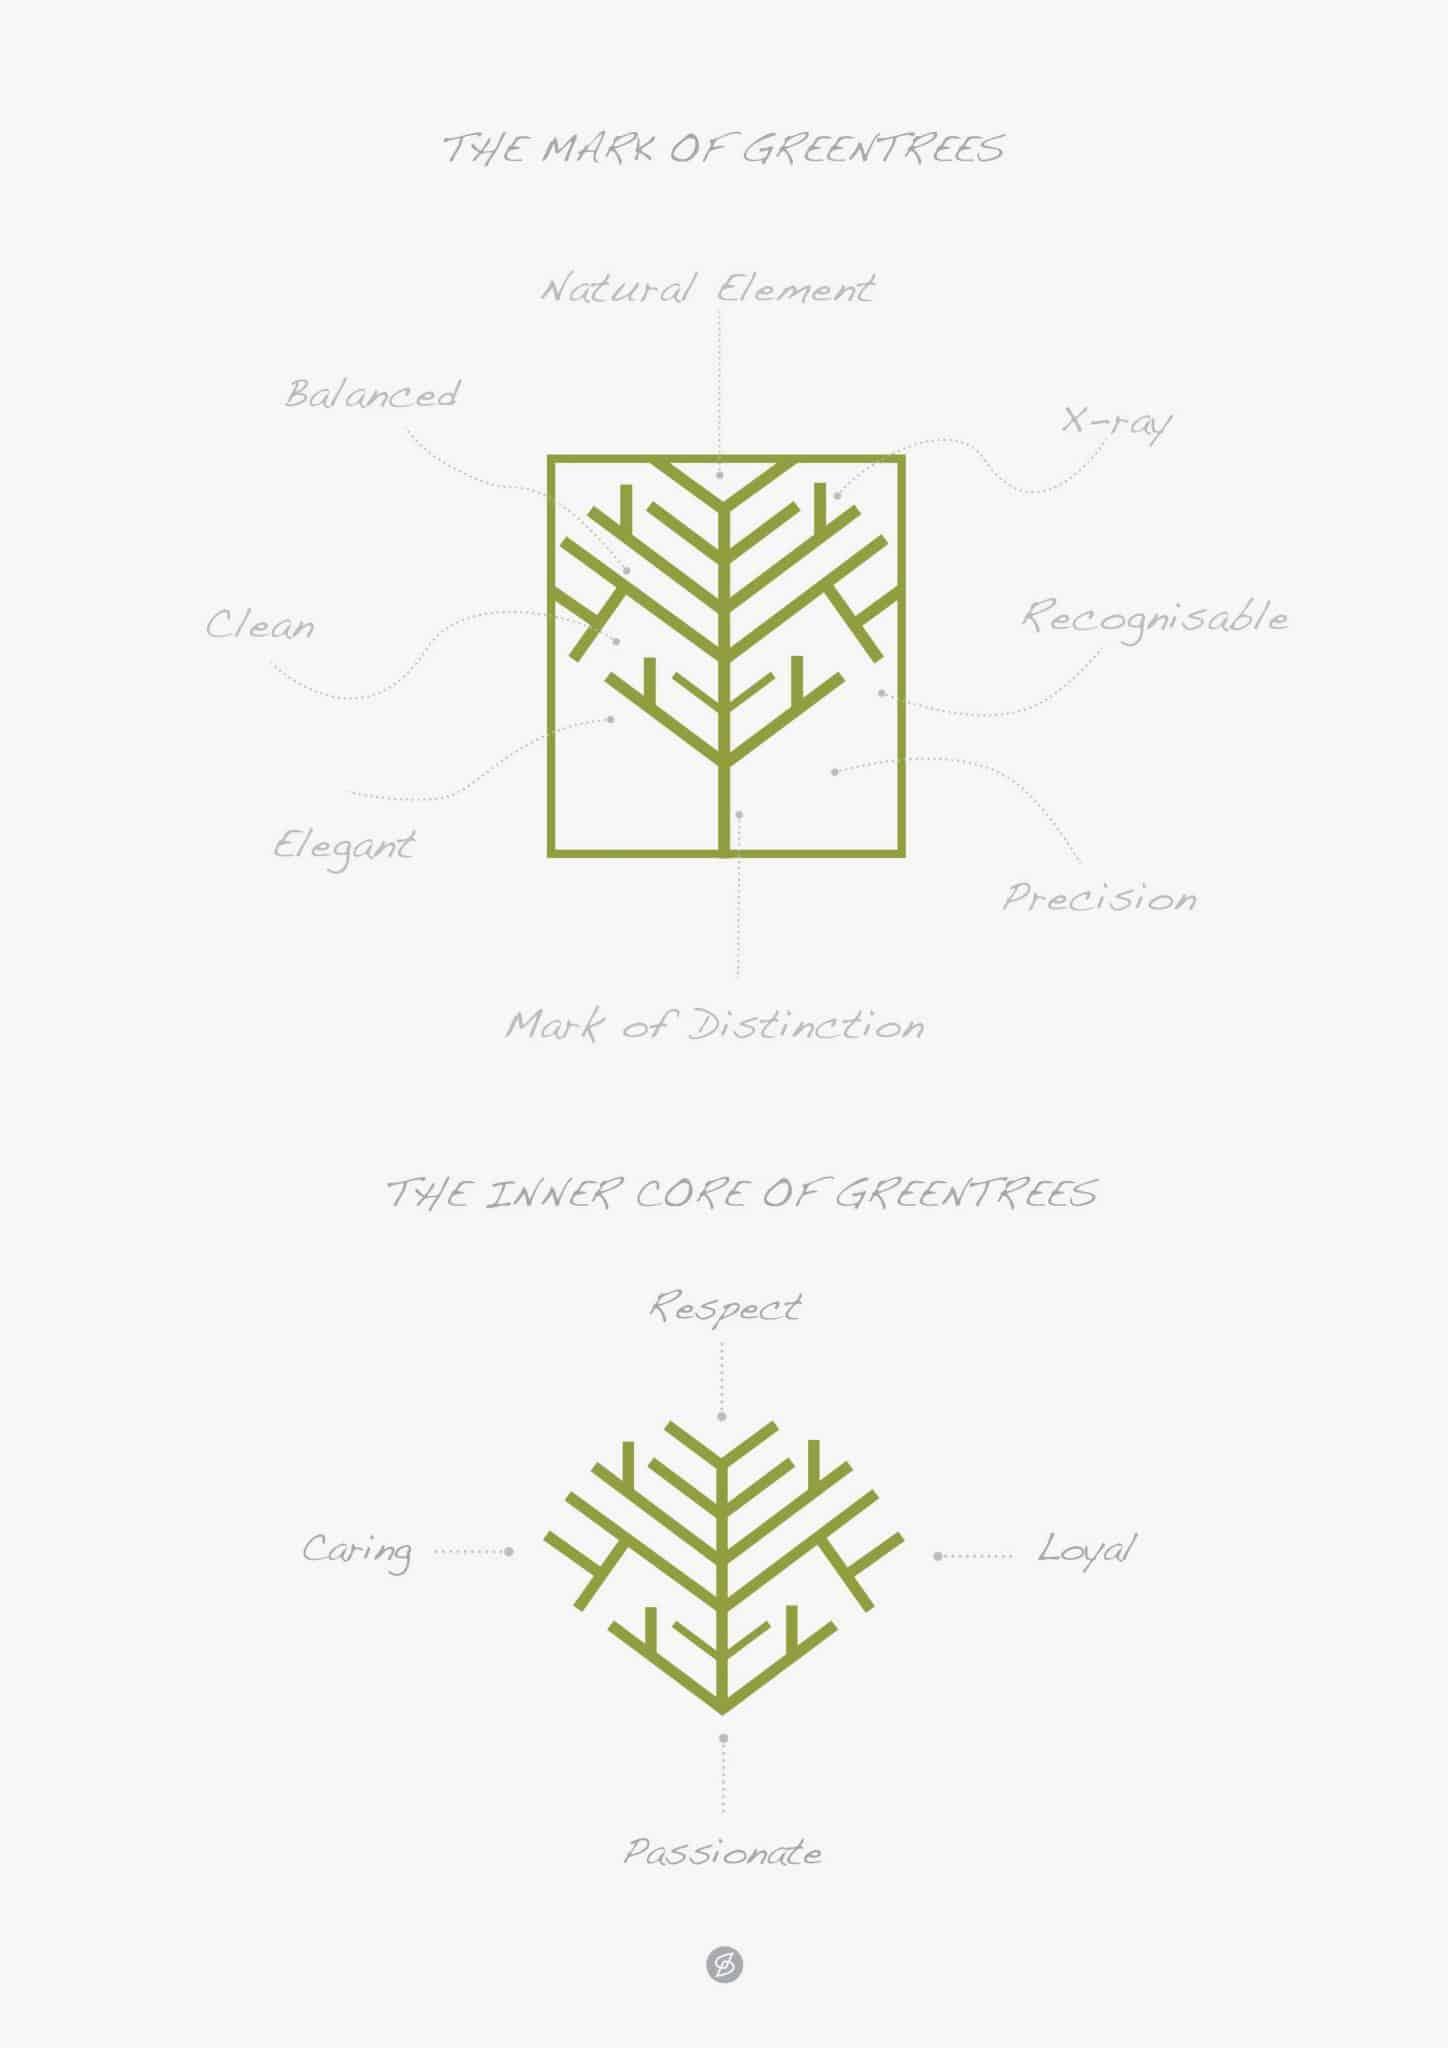 Greentrees-ethos